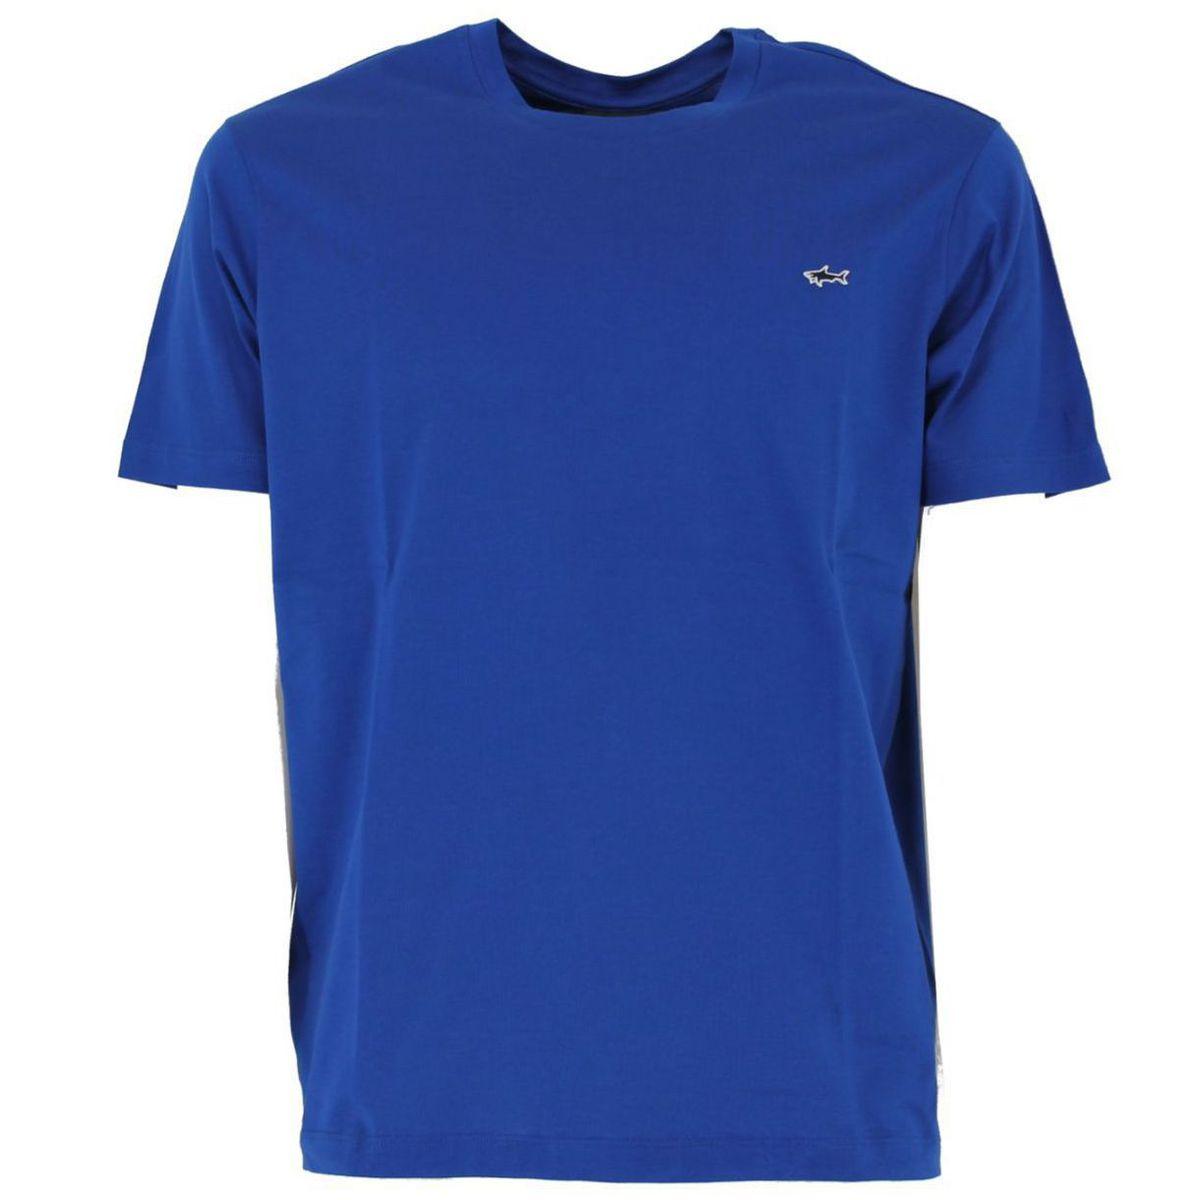 T-shirt in cotone con logo ricamato Azzurro PAUL & SHARK